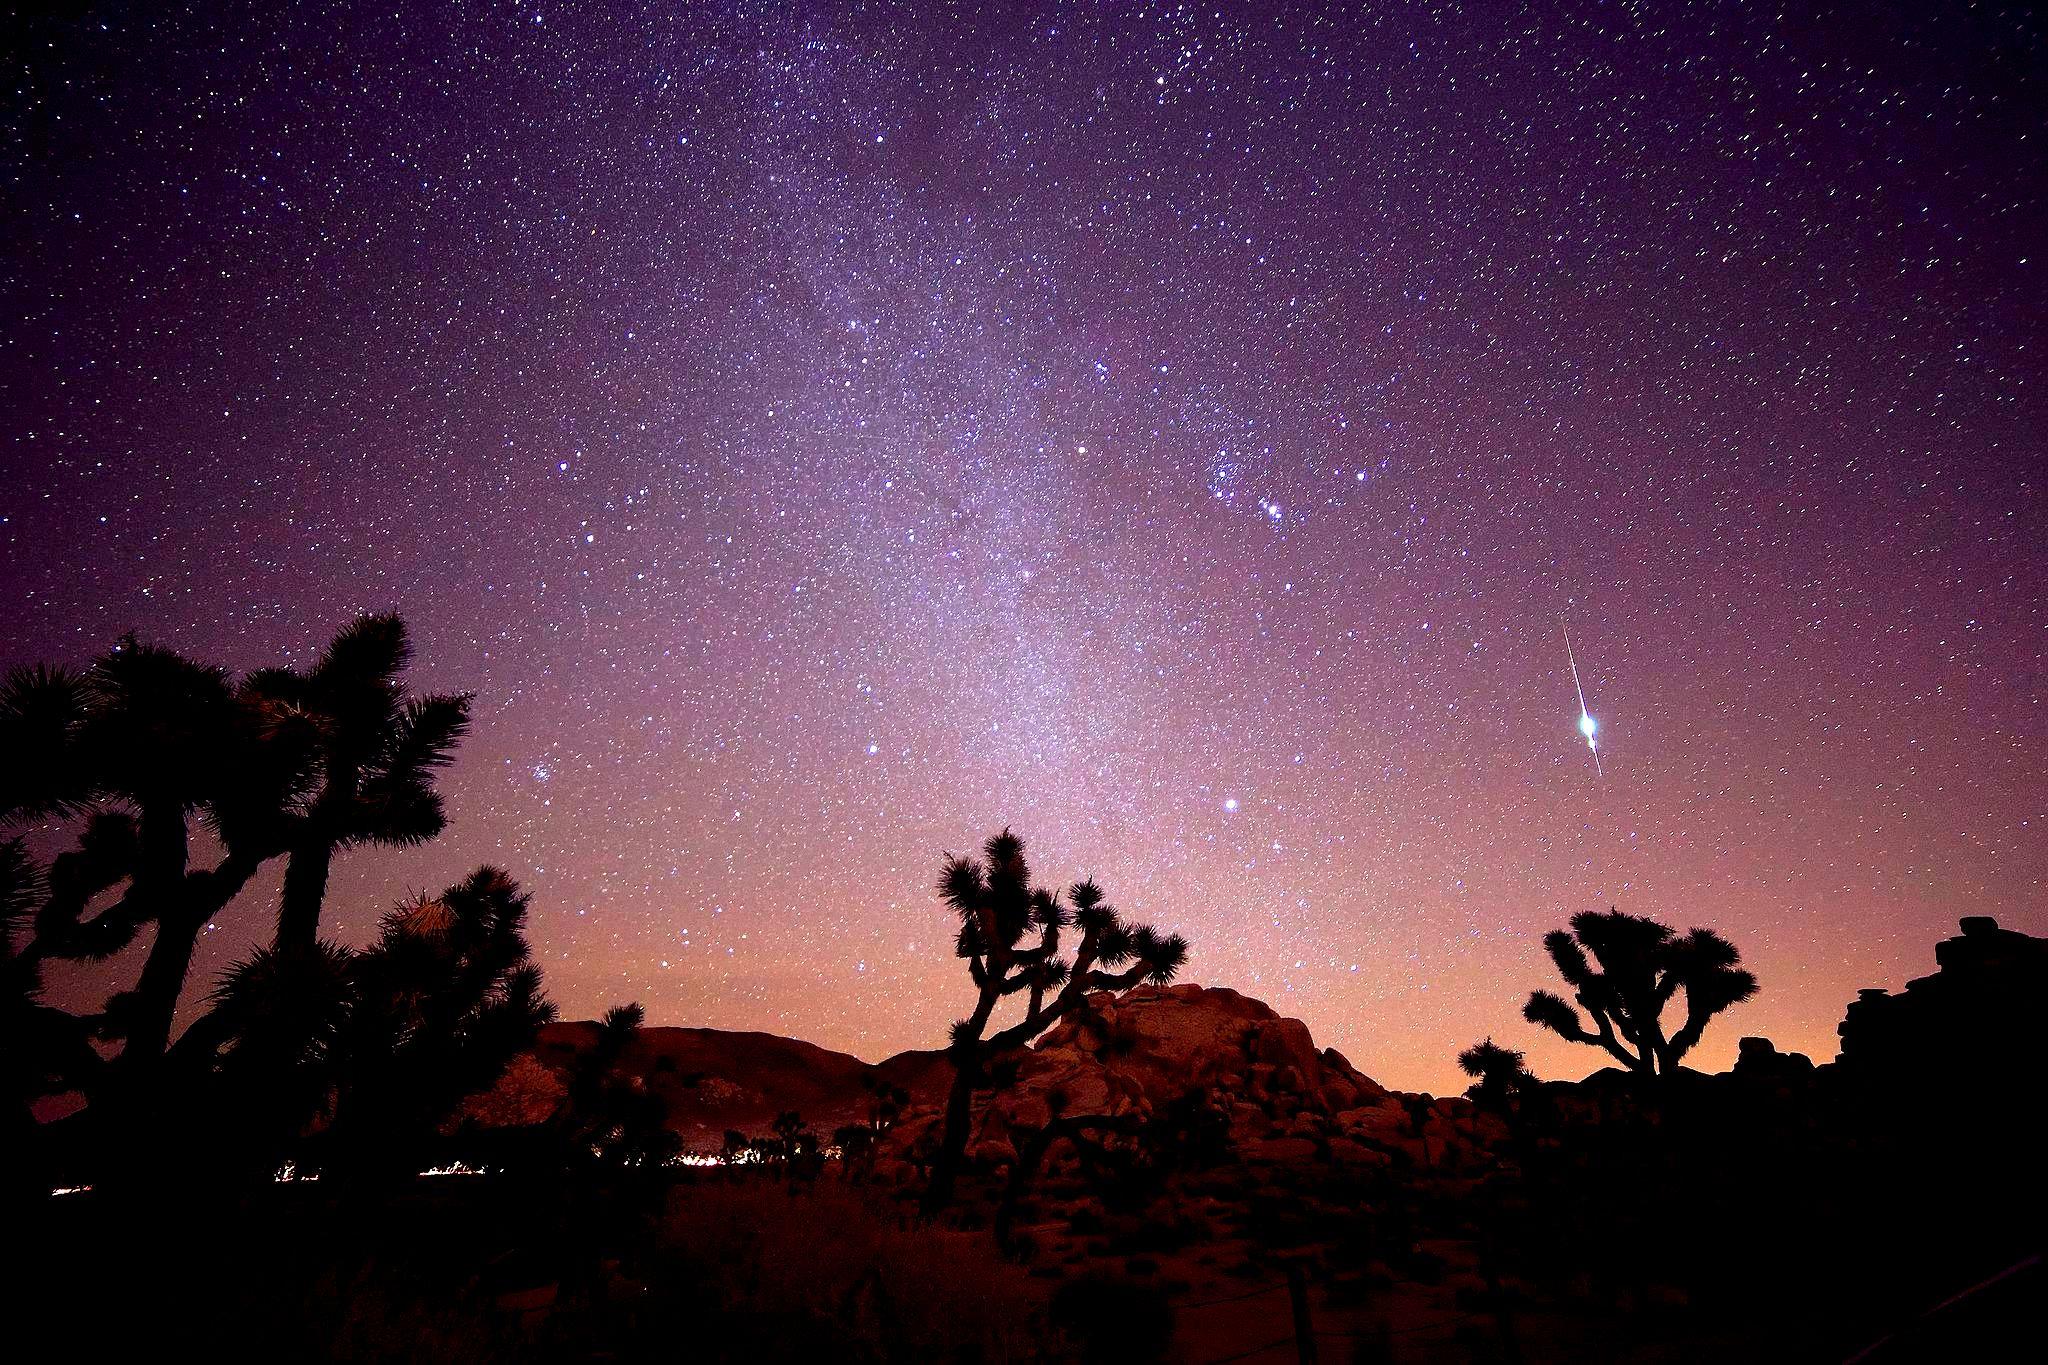 Kentucky Fall Wallpaper Meteor Showers Calendar 2017 Dates And Viewing Tips